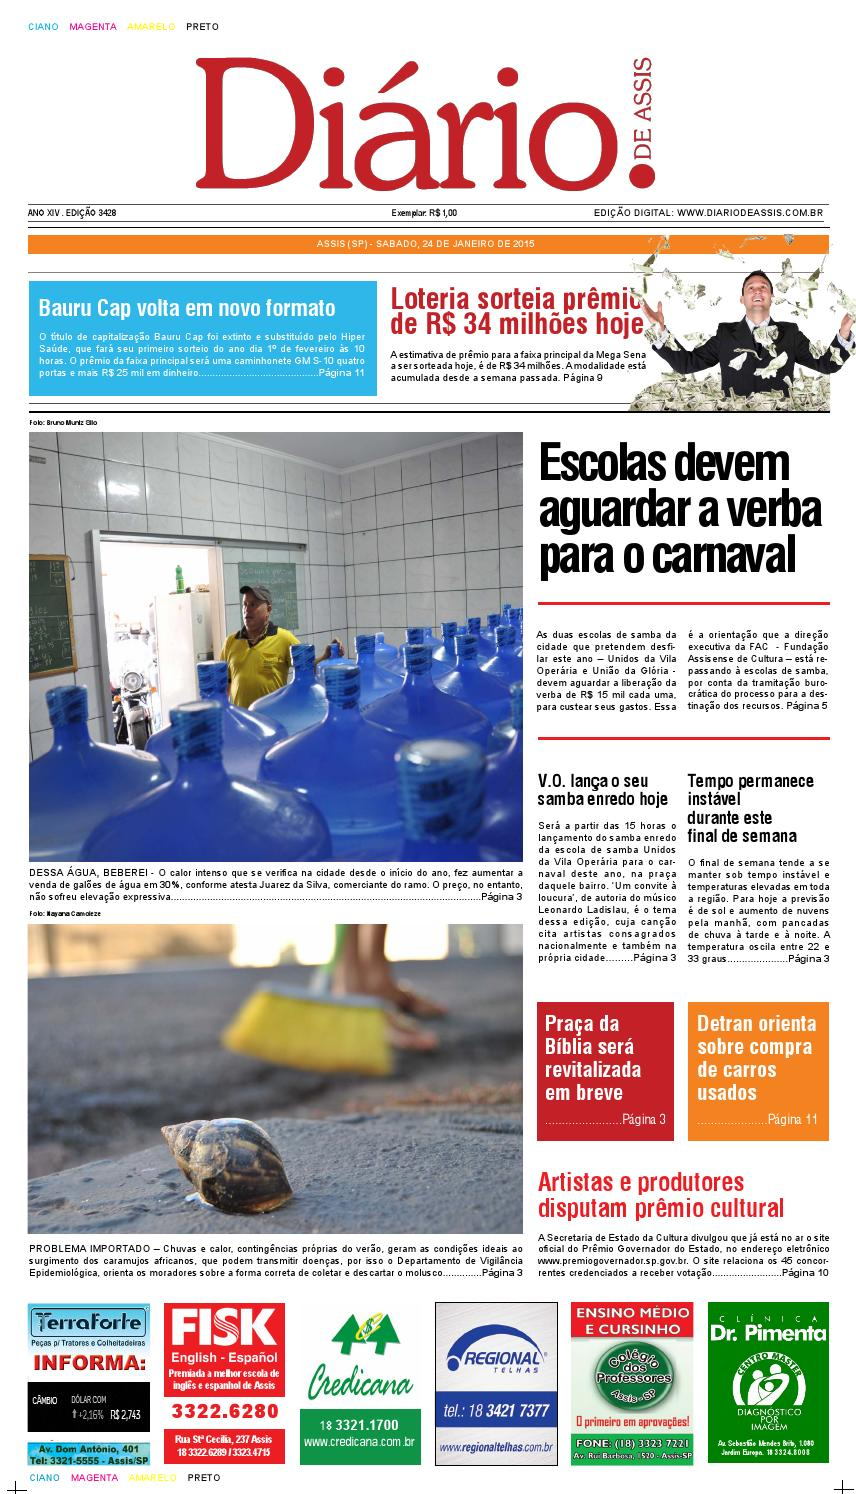 Jornal 24 01 15 by WEB5 Services of Internet - issuu fcf6914e3e399